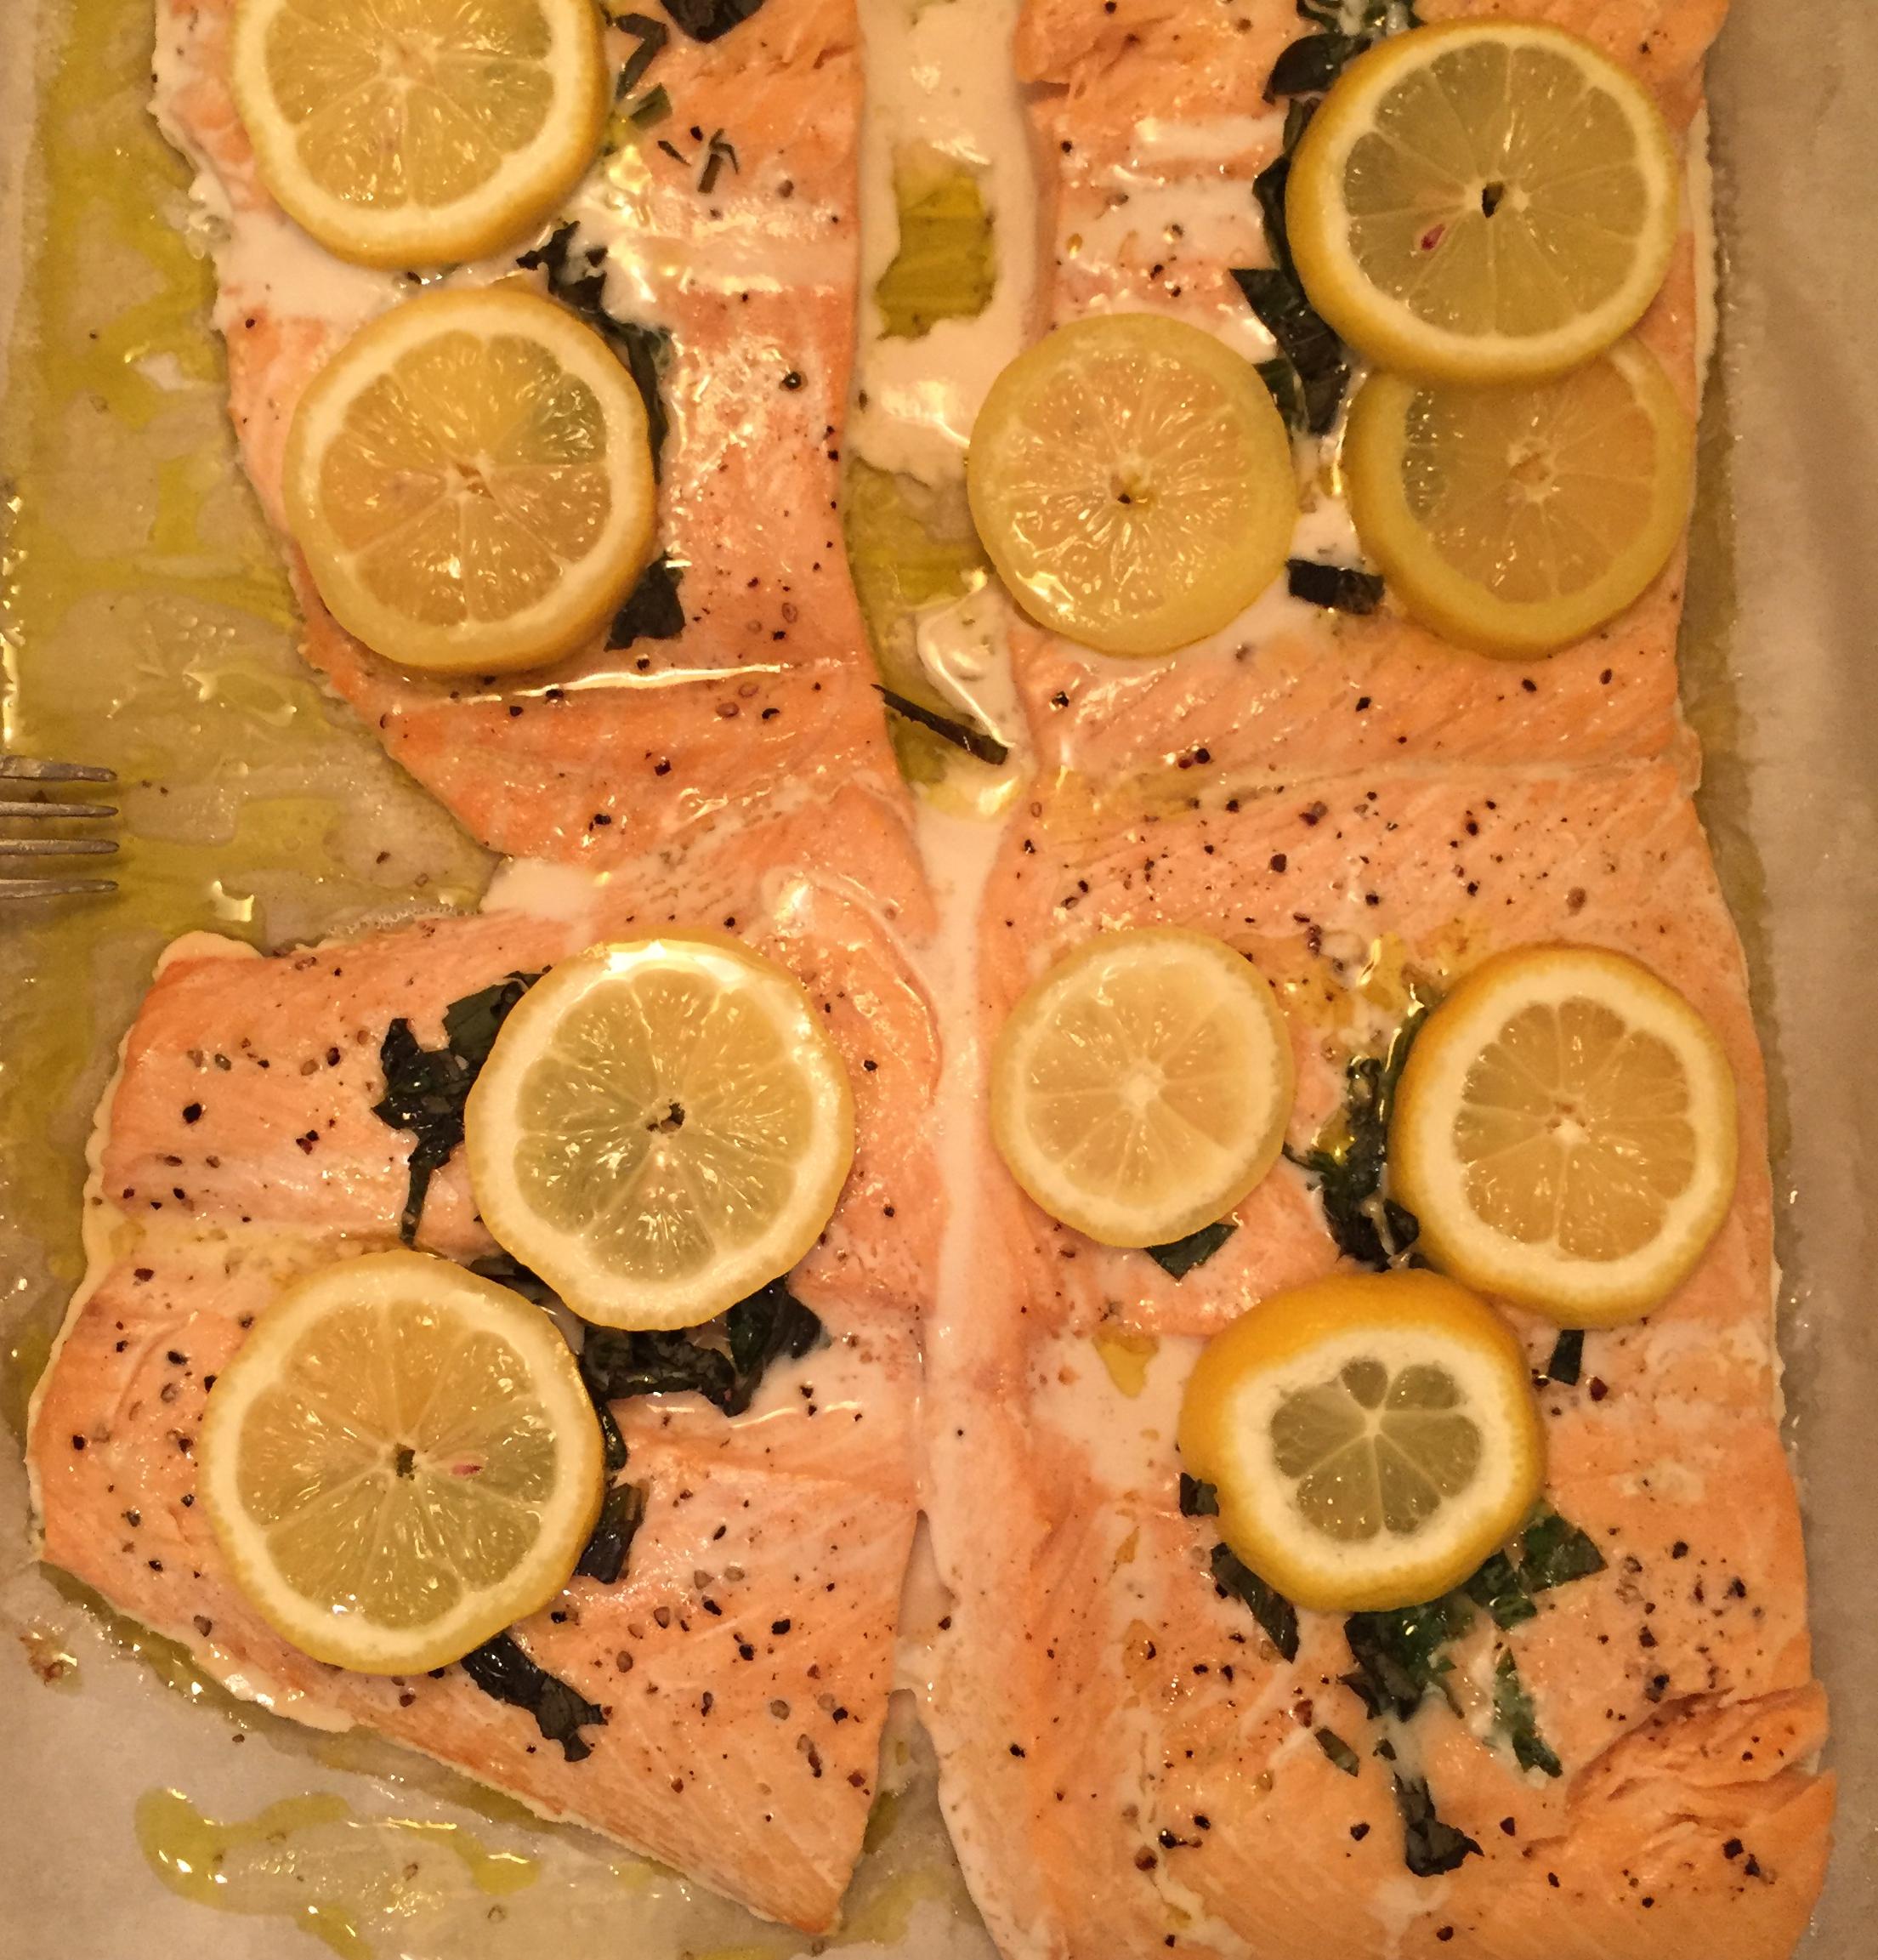 Parchment Baked Salmon kennyhallcooks